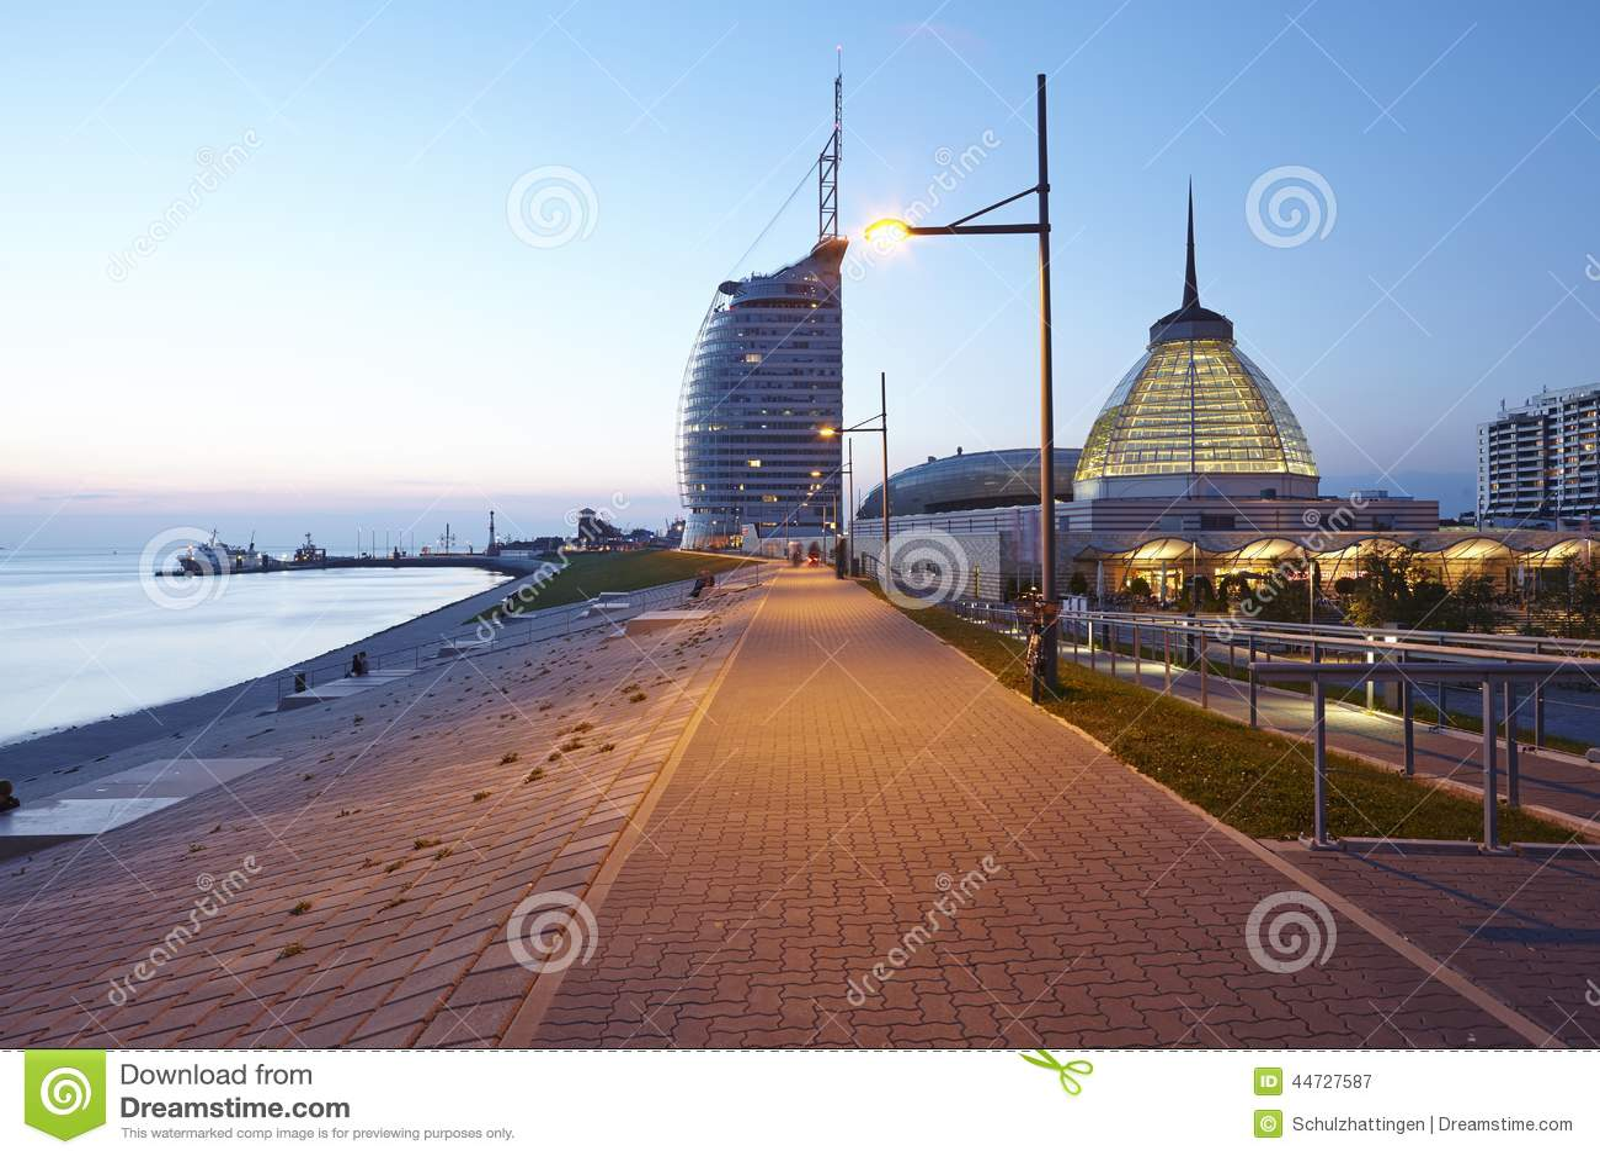 Bremerhaven (Alemanha) - passeio à beira mar na noite